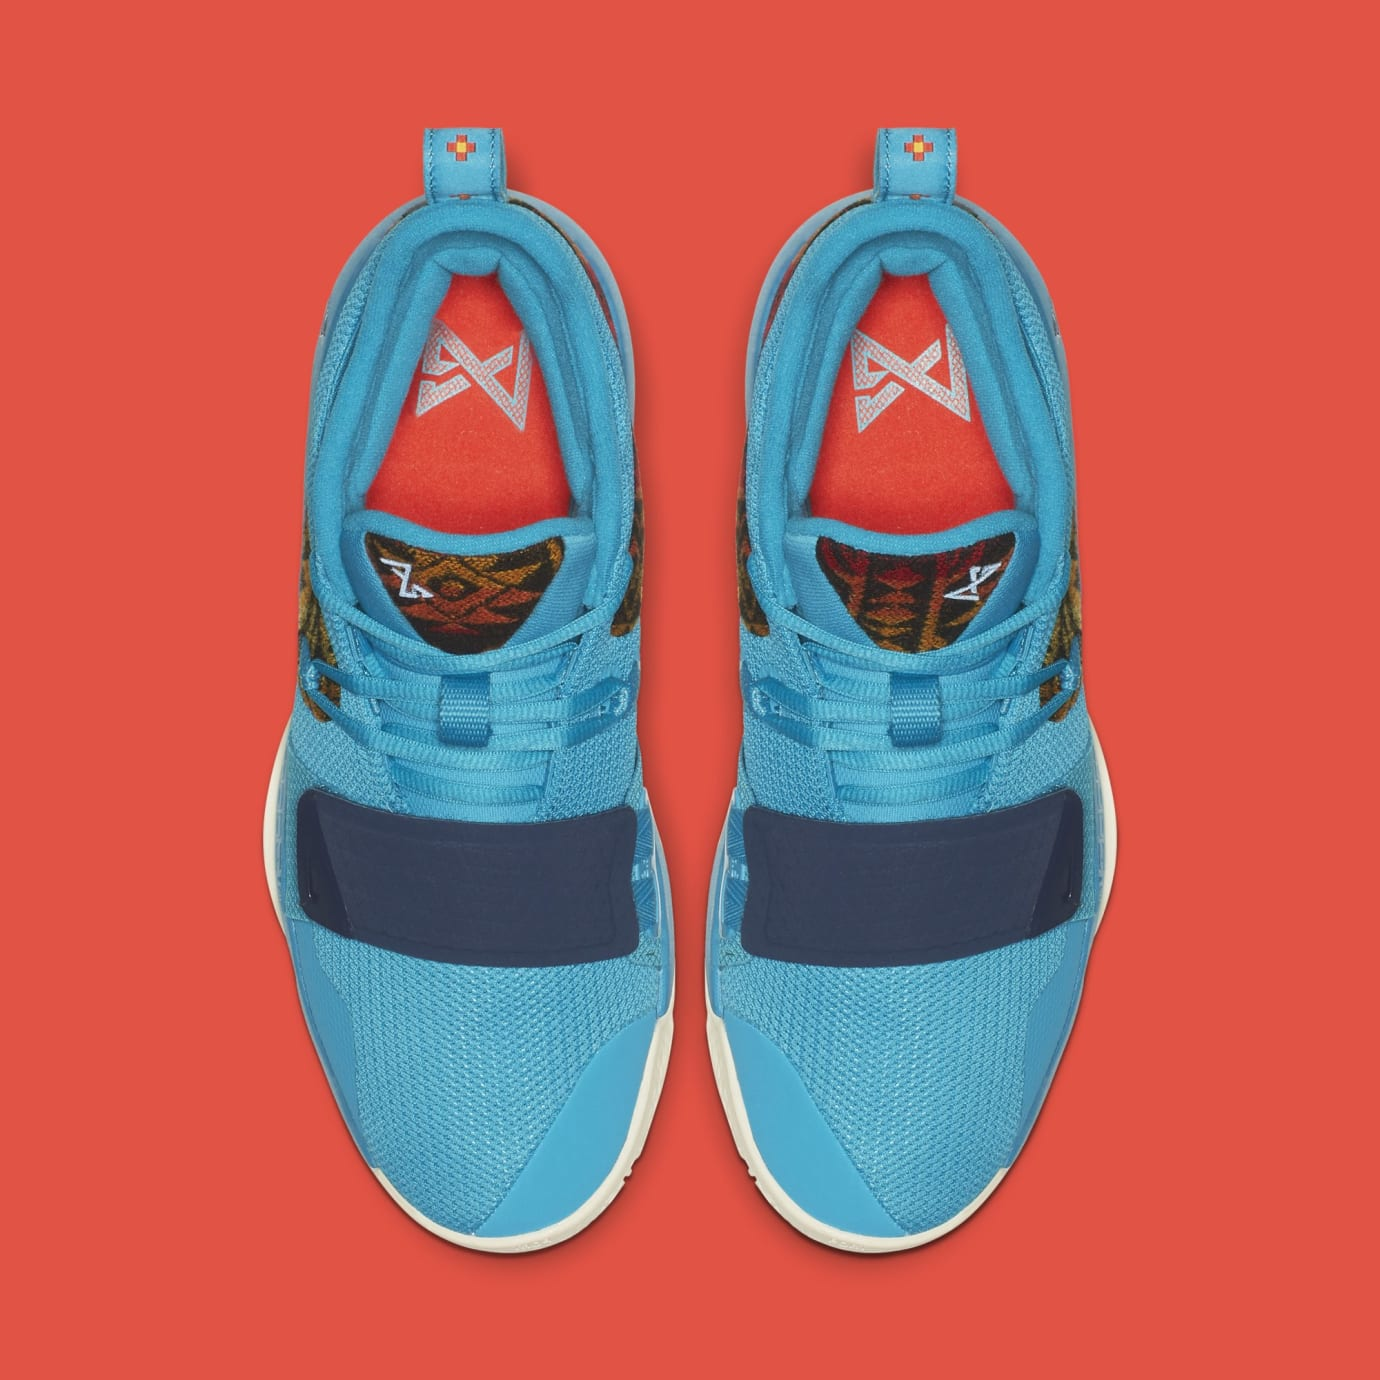 Nike PG 2.5 'Pendleton' Multi-Color/College Navy CI0294-900 (Top)